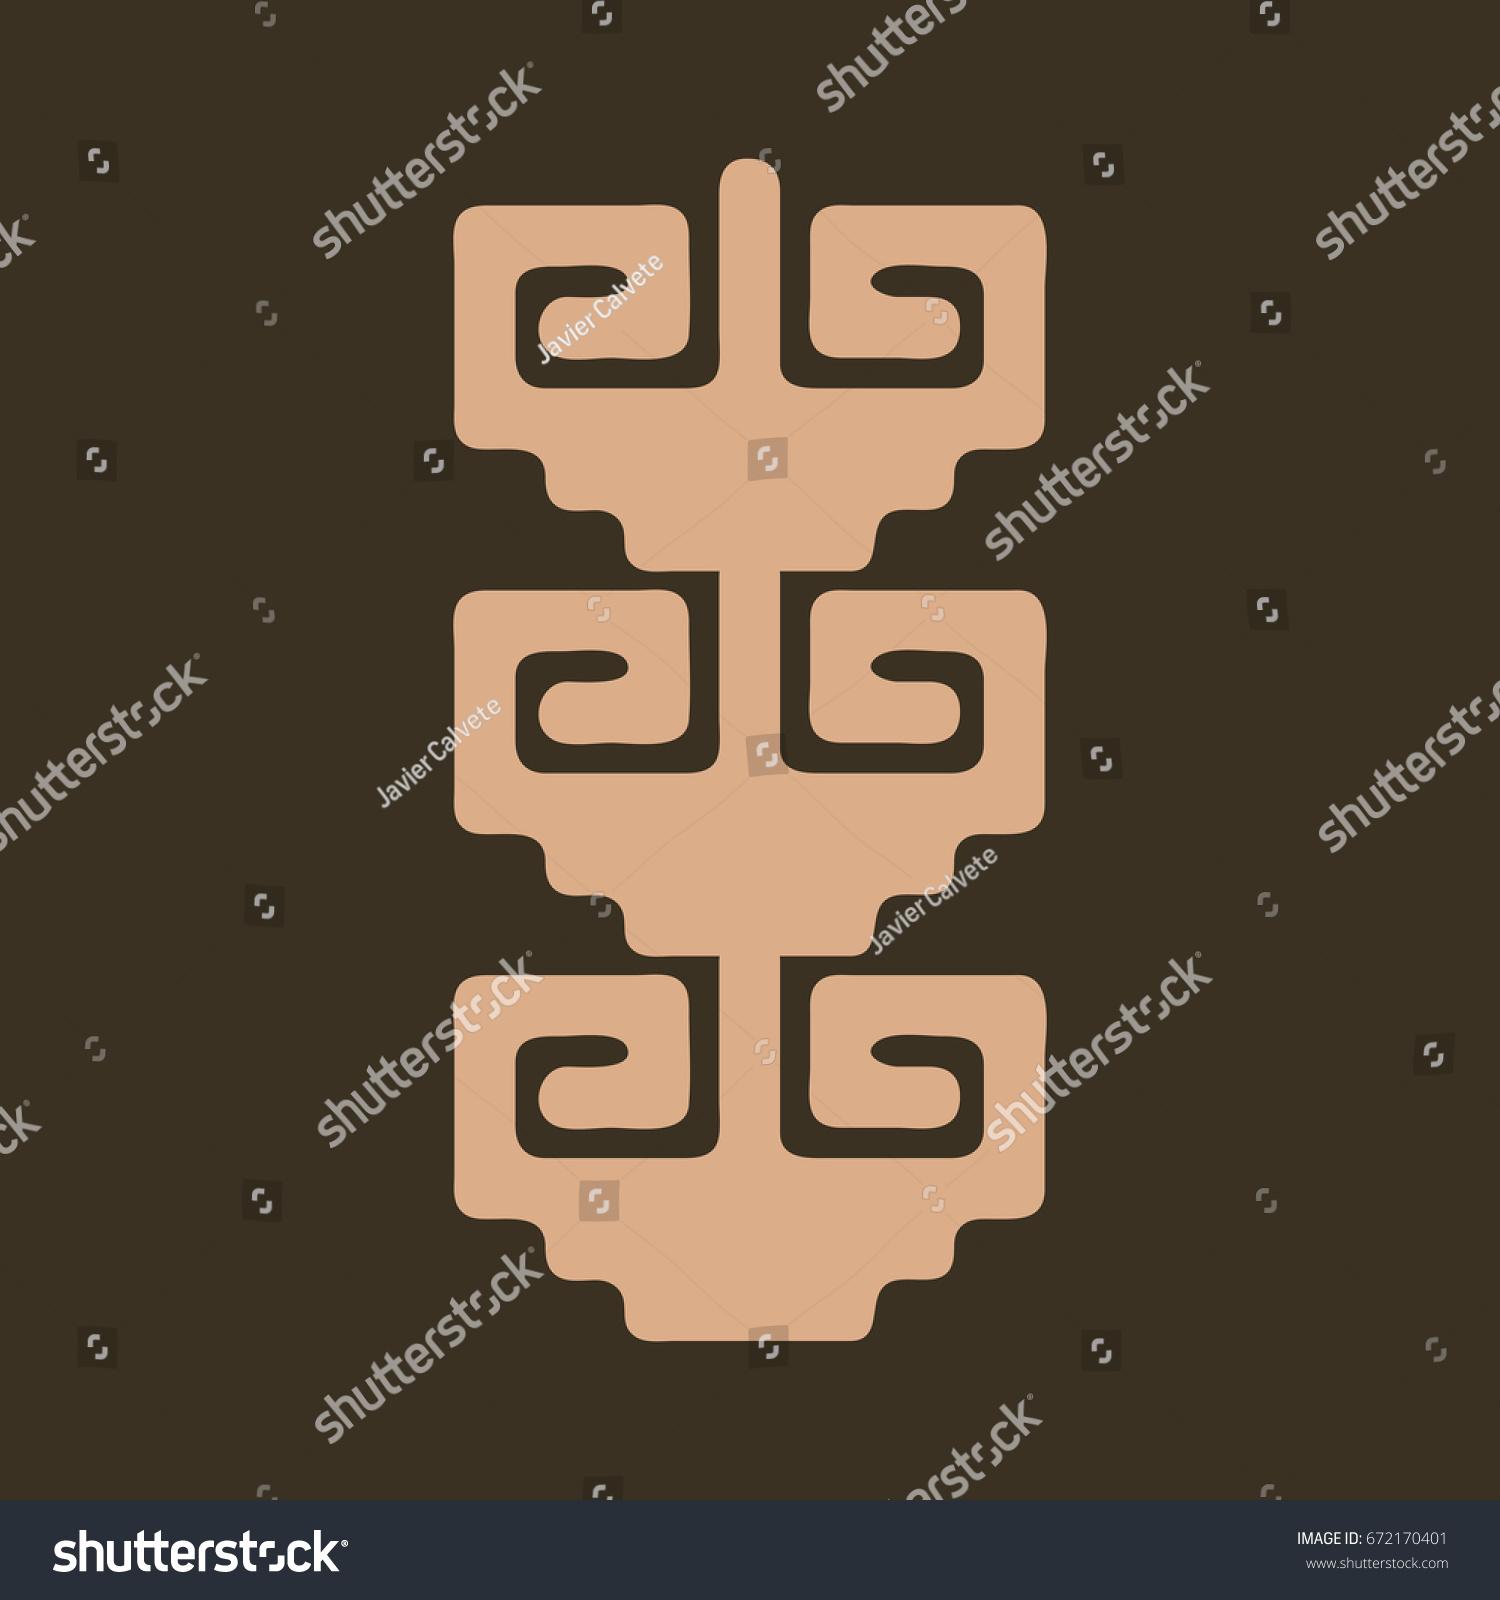 Symbols ancestors latin american cultures stock vector 672170401 symbols ancestors latin american cultures buycottarizona